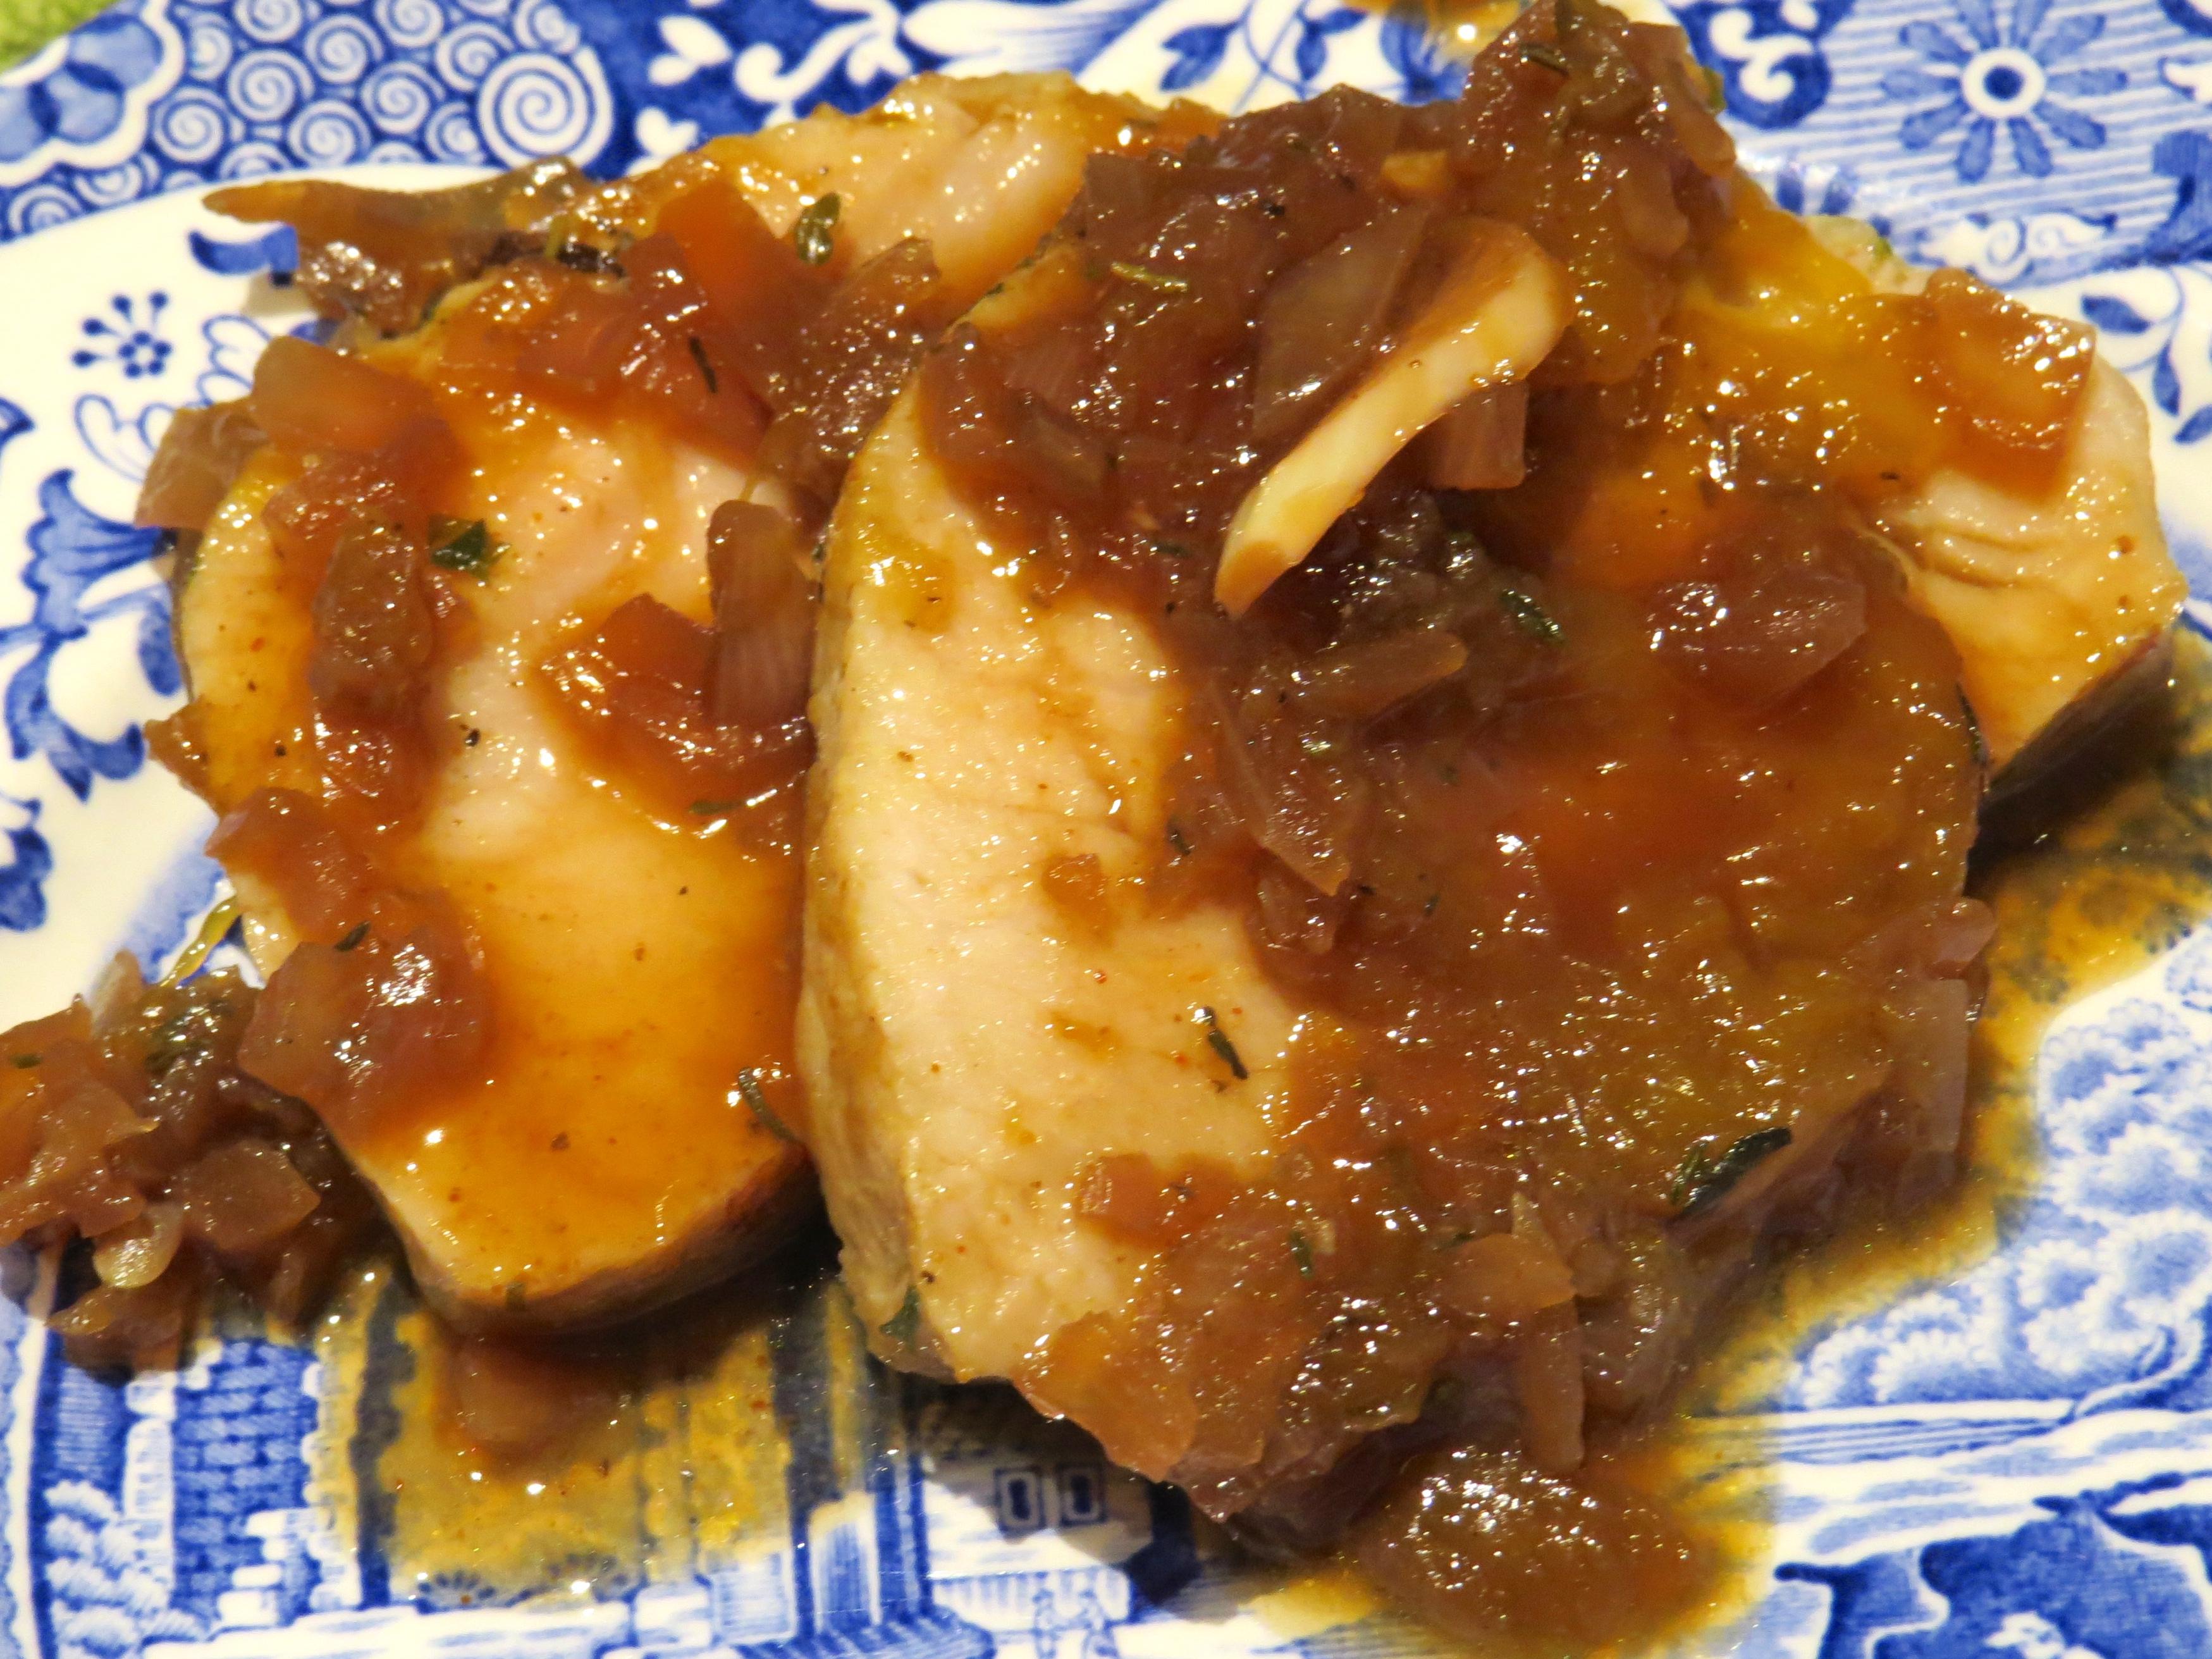 Slices of Pork Roast with Mangoes & Preserved Lemons